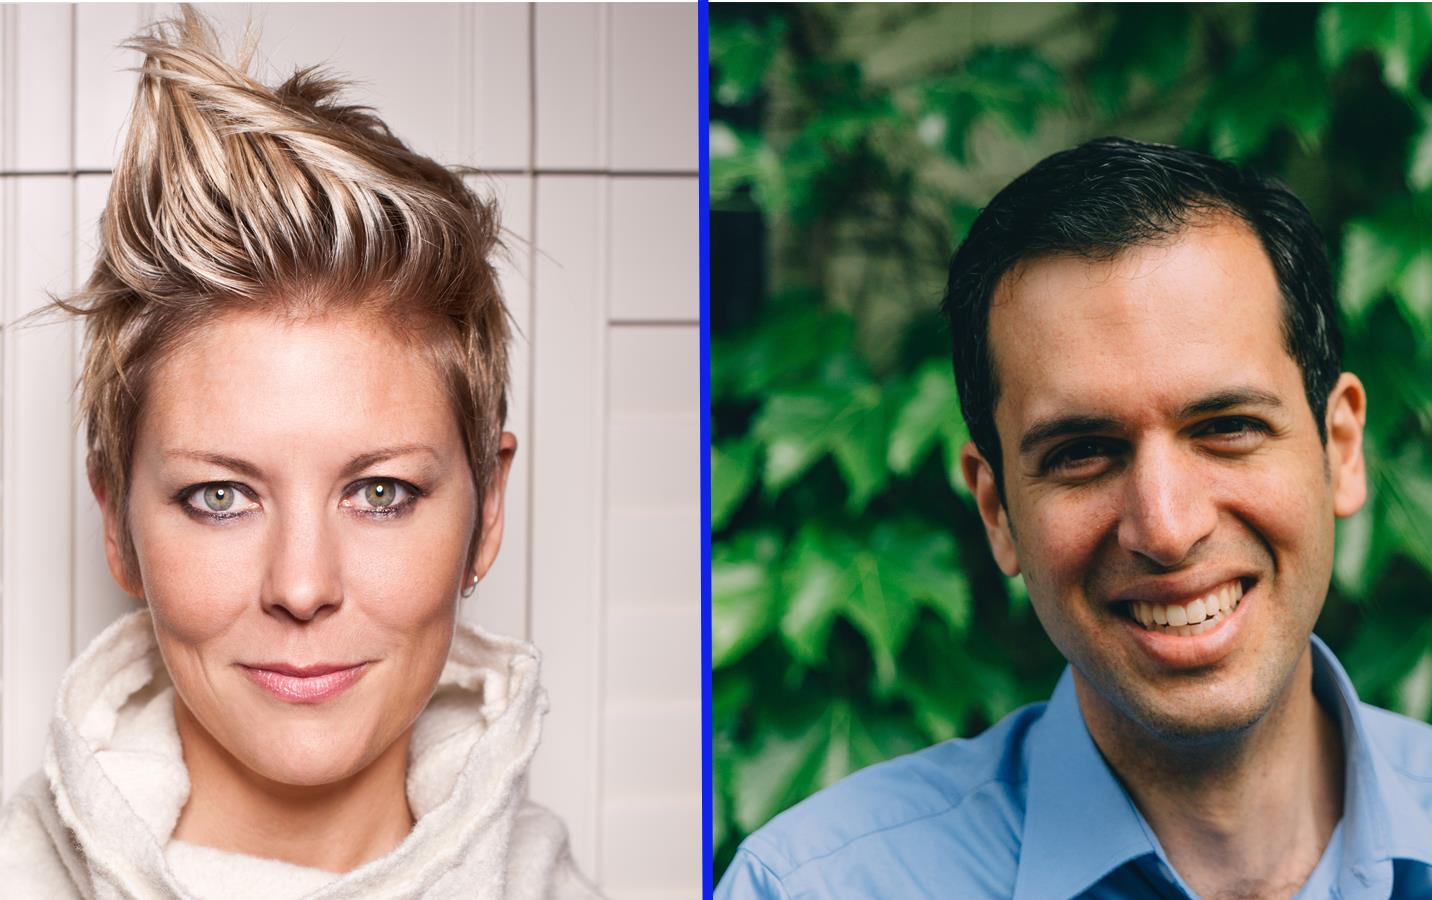 Headliners Dr. Morgaine Gaye and Daniel Stone